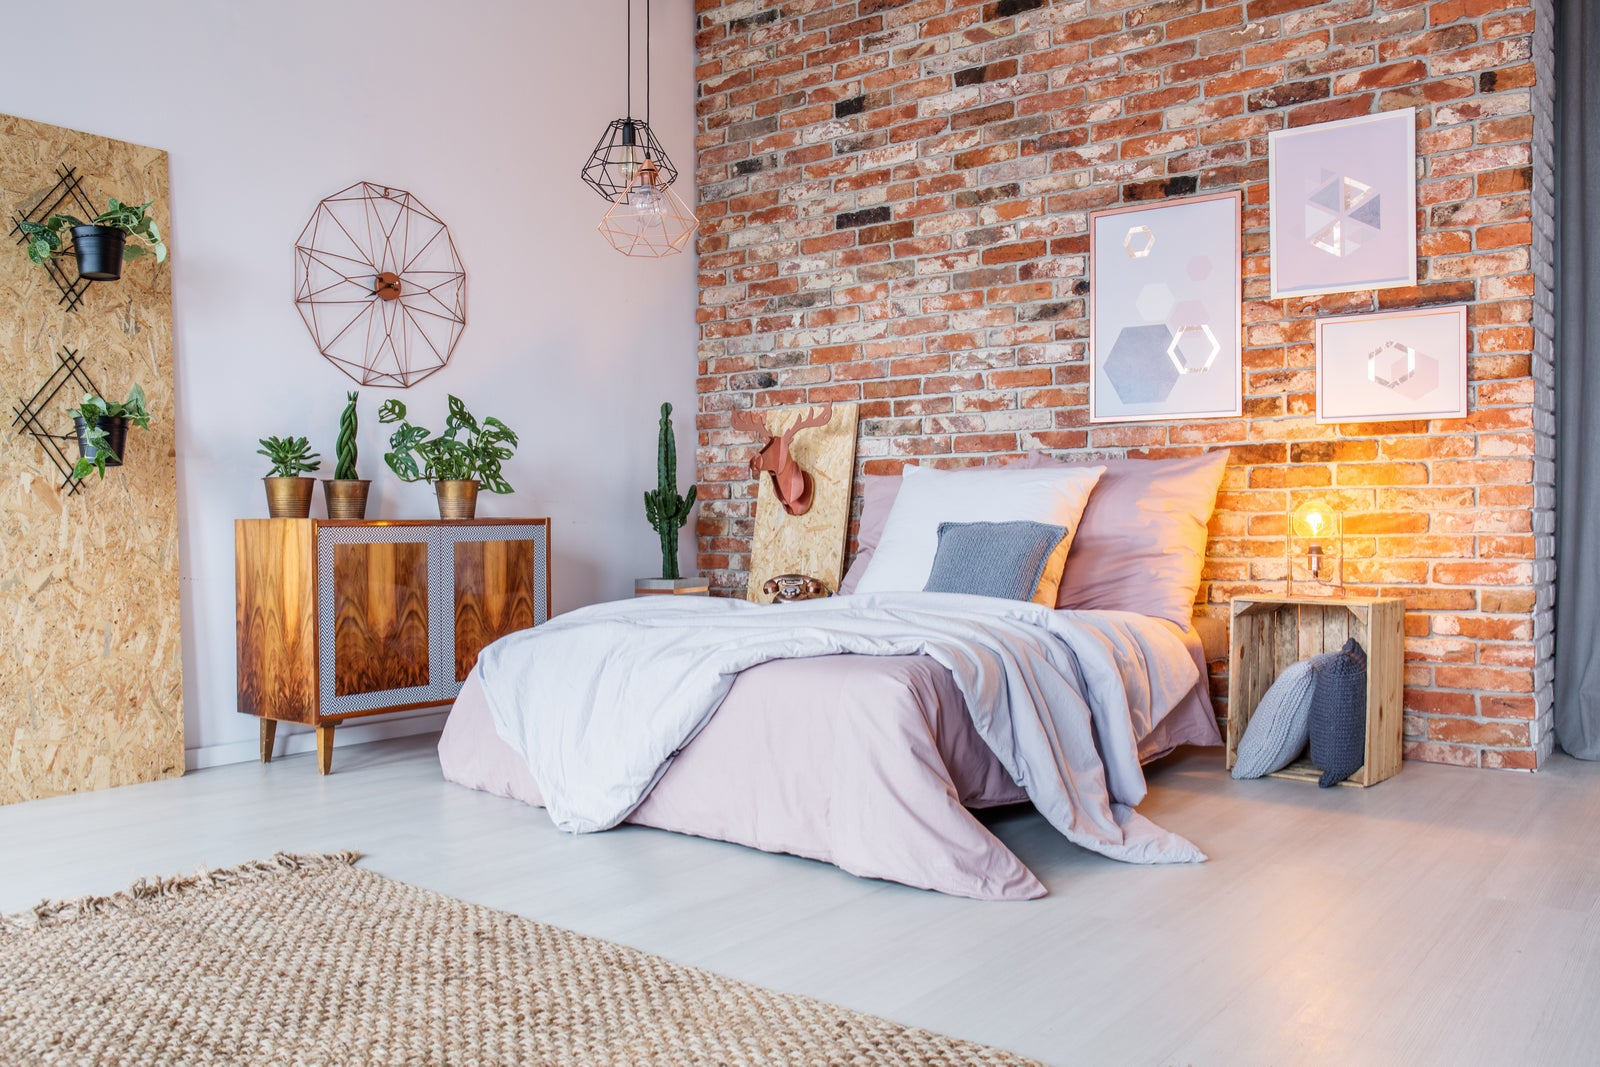 Lofts de estilo industrial: Materiais aparentes